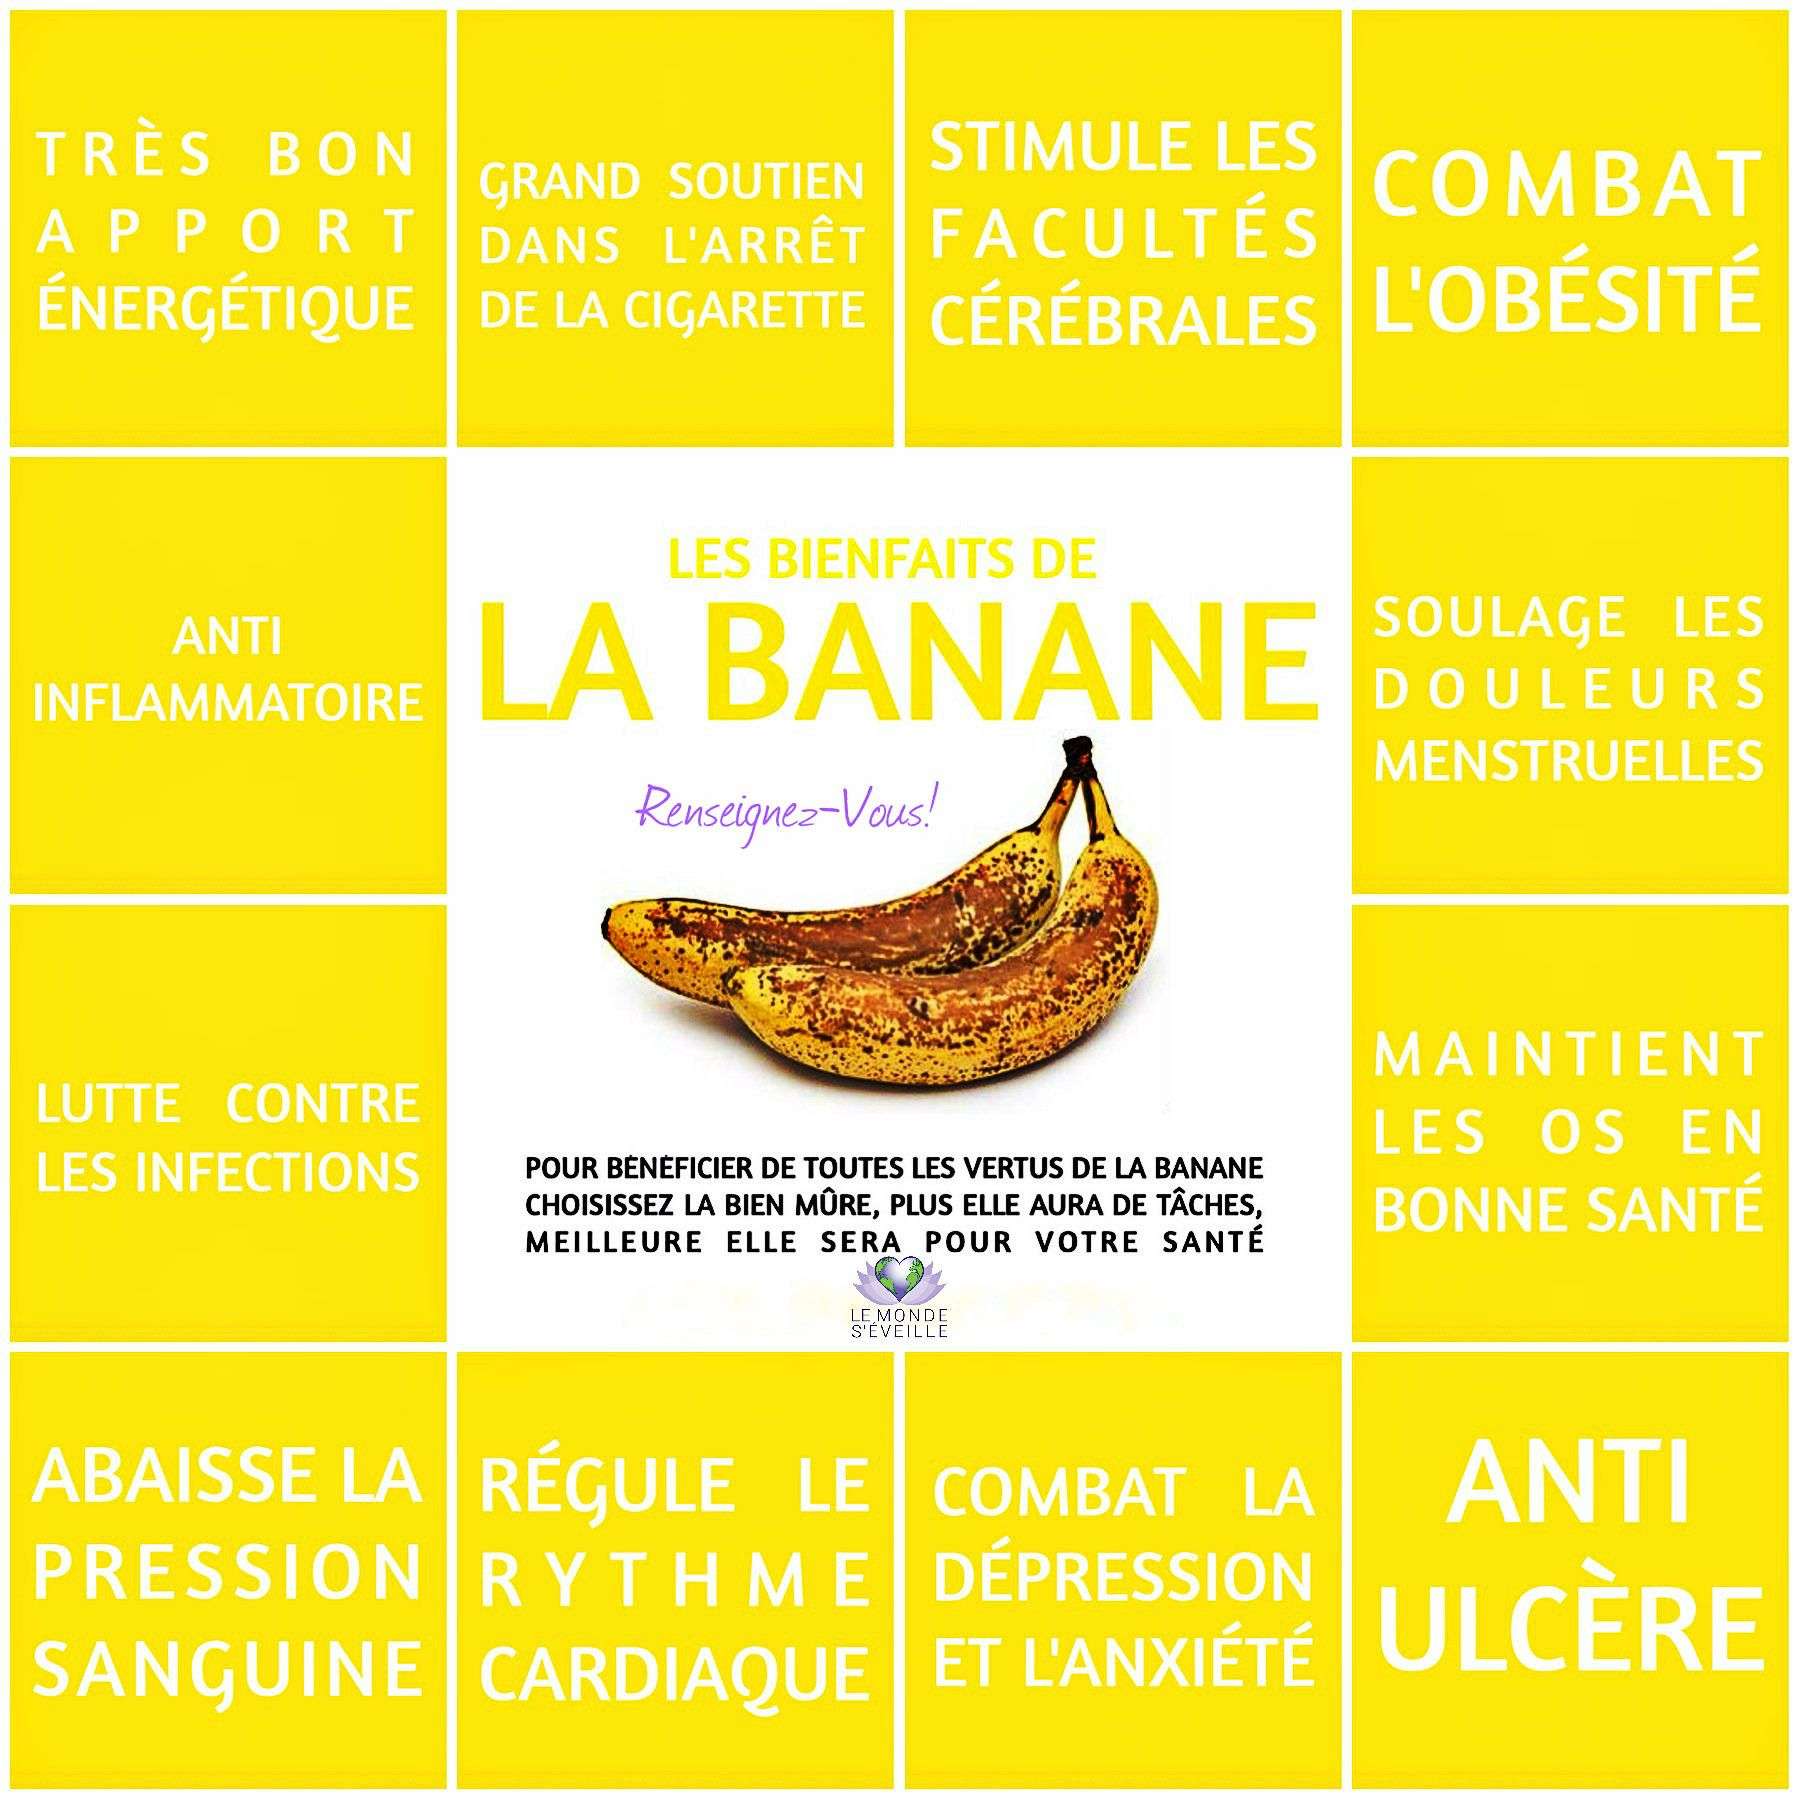 banane sant pinterest bienfaits de la banane la banane et veill. Black Bedroom Furniture Sets. Home Design Ideas